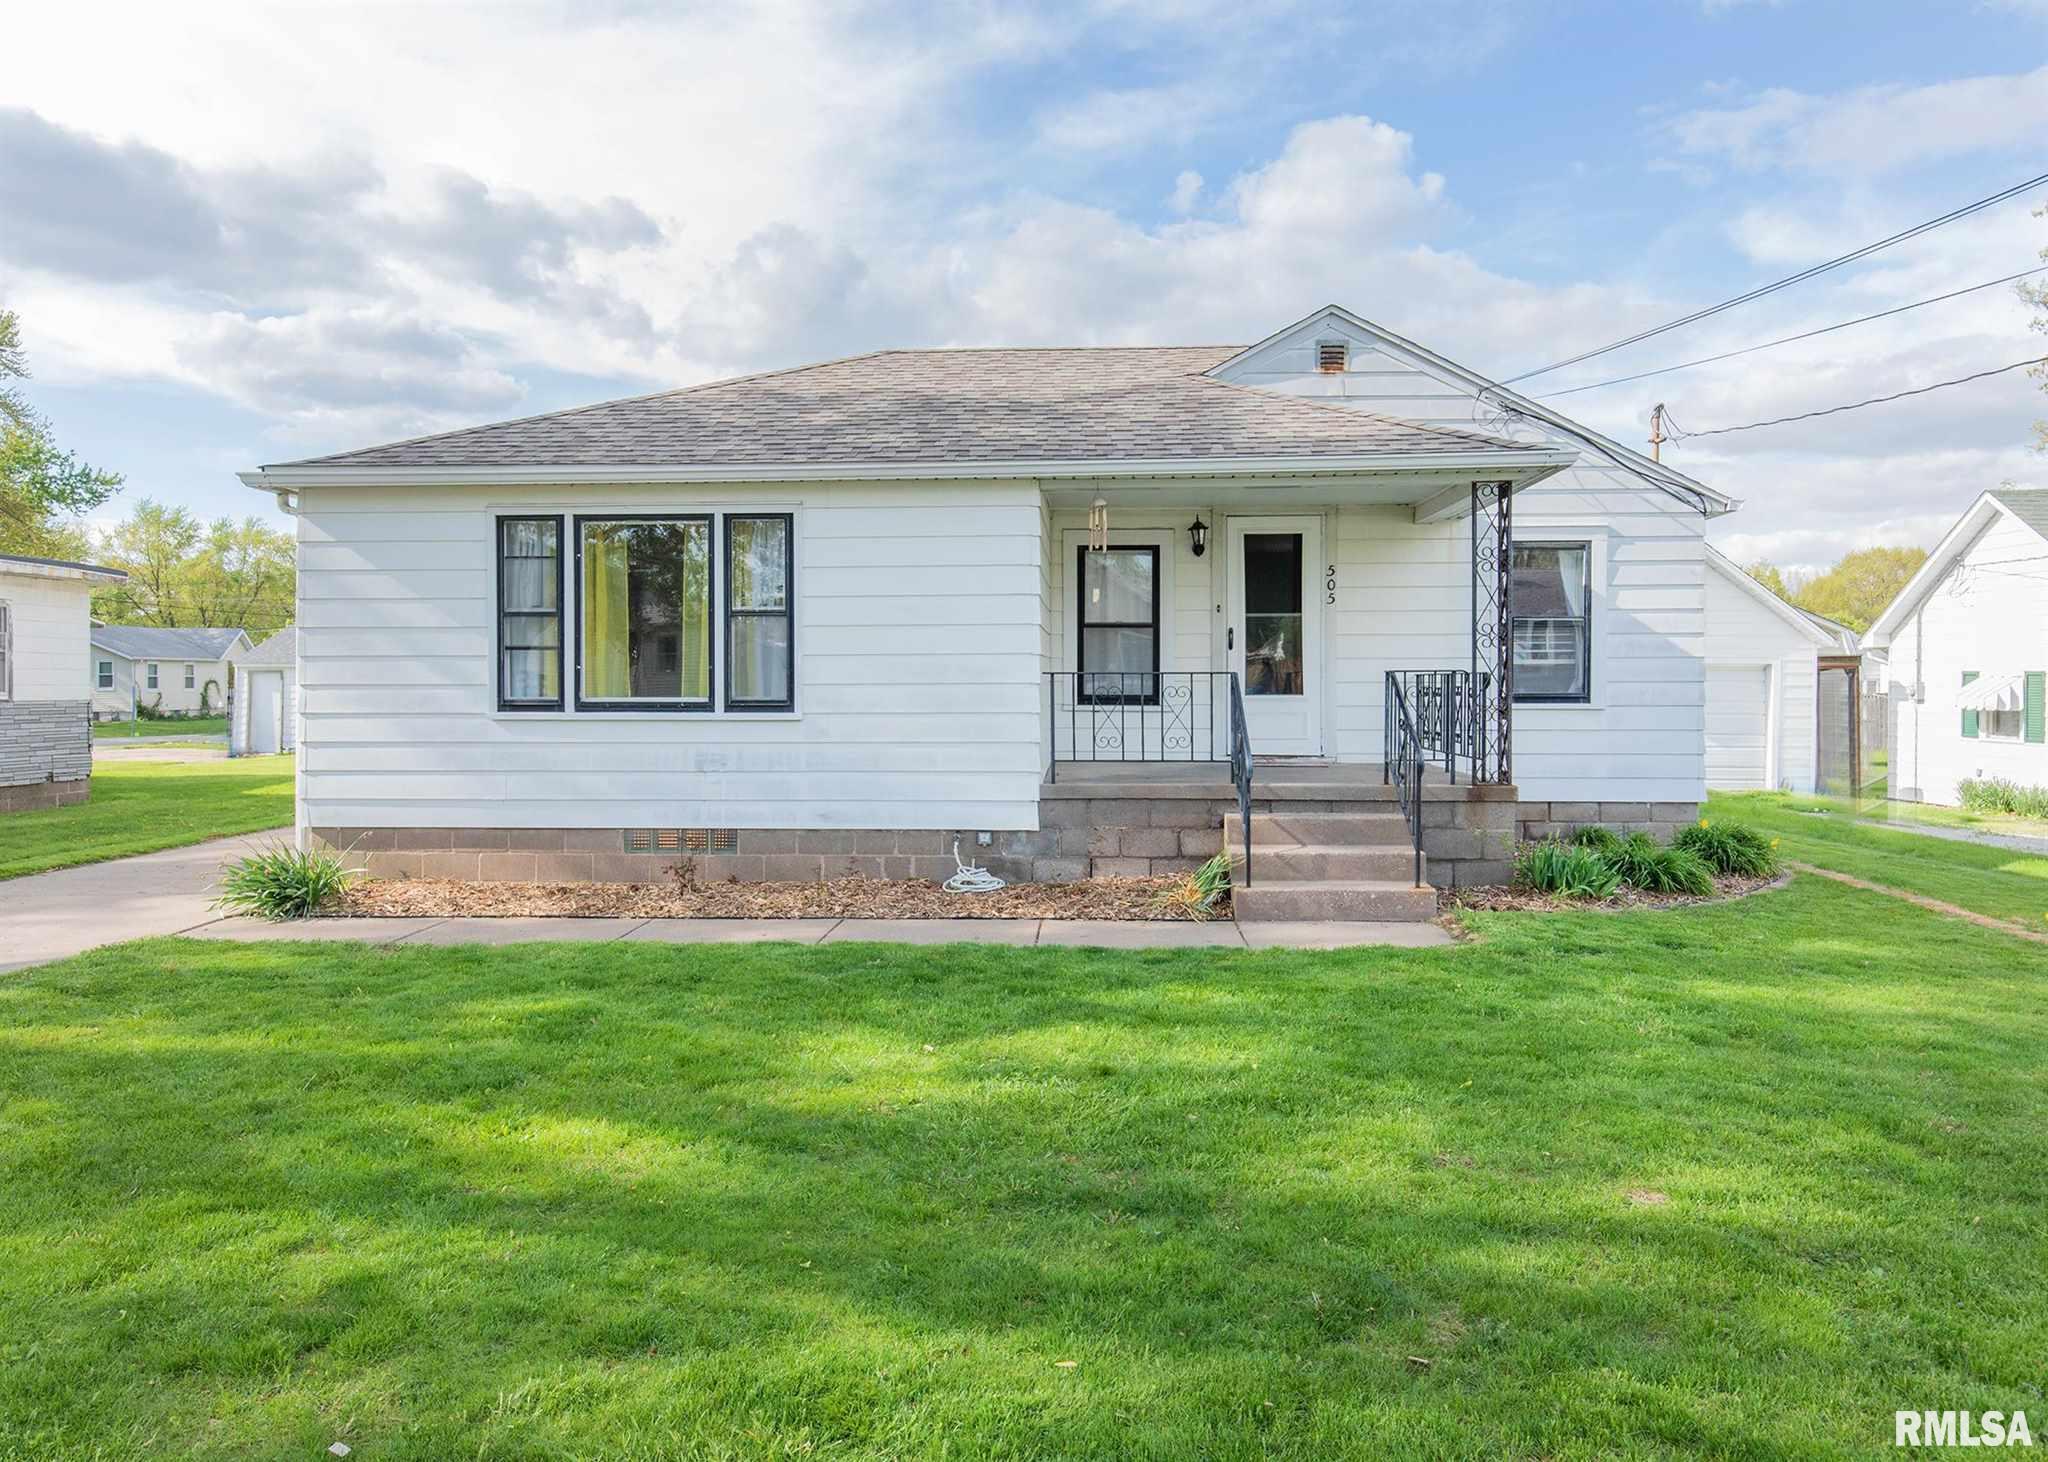 505 8TH Property Photo - Silvis, IL real estate listing